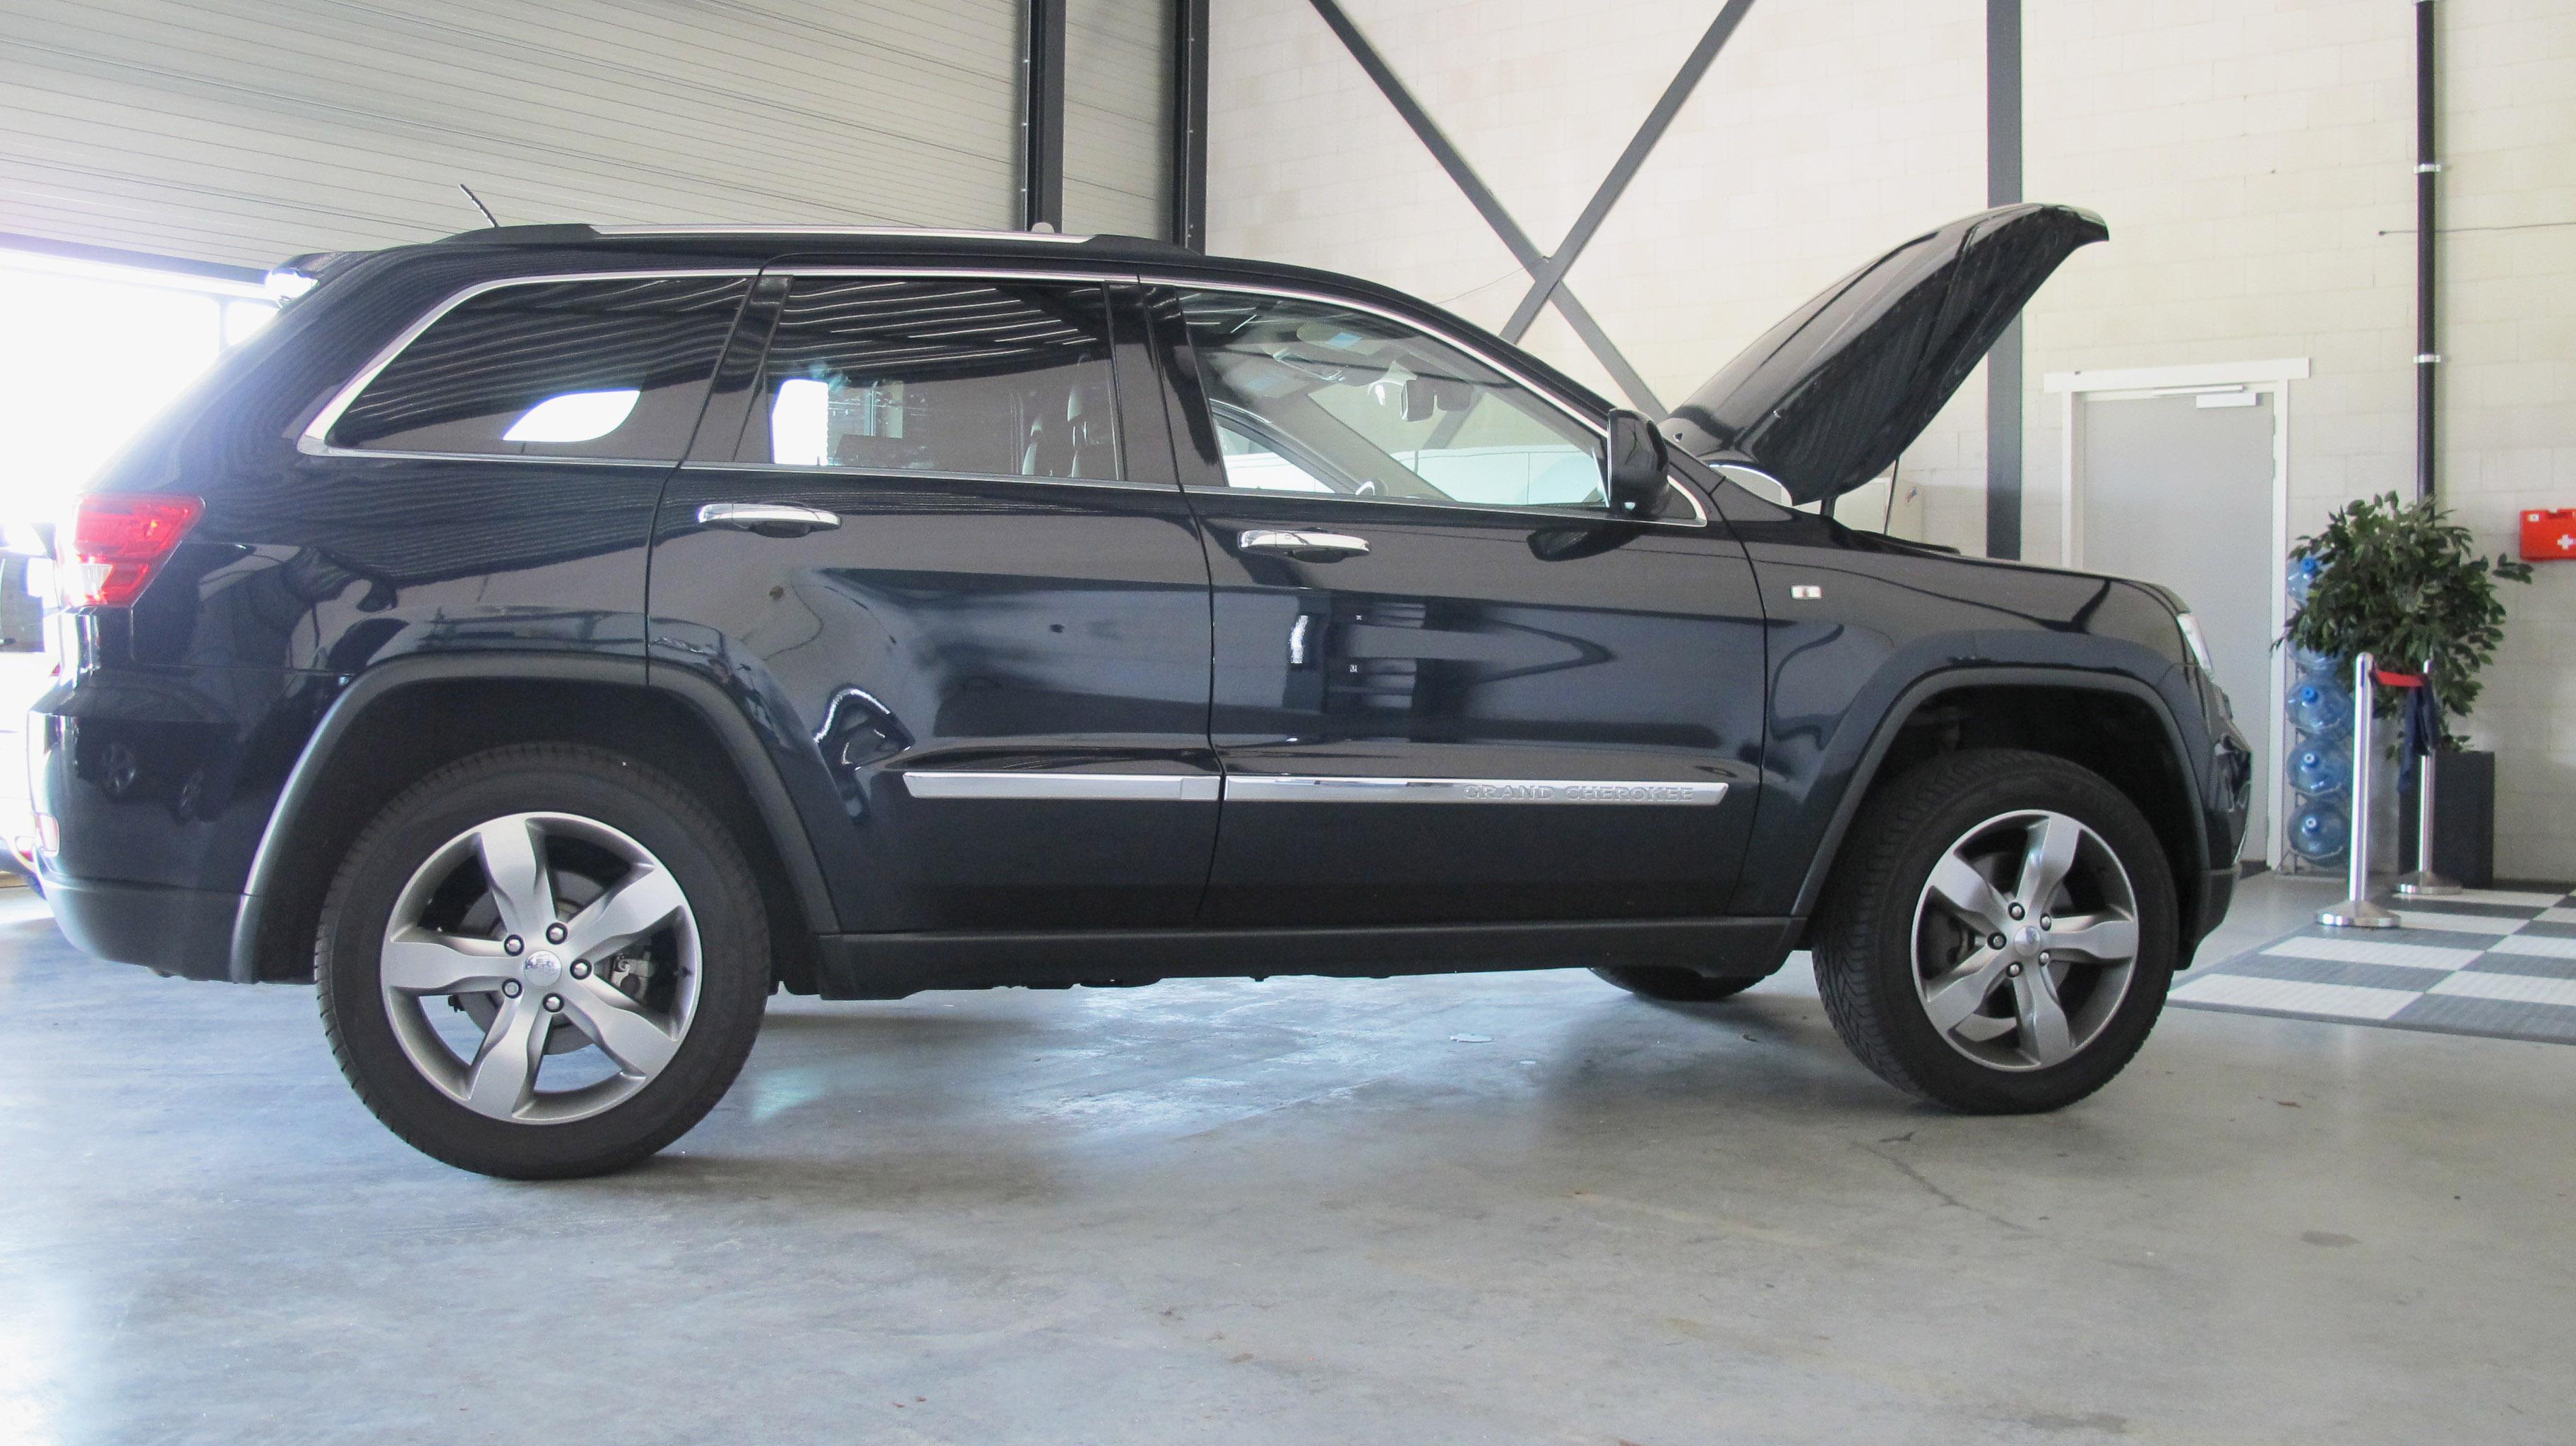 reprogrammation jeep grand cherokee 3 0 crd 190 cv 2011. Black Bedroom Furniture Sets. Home Design Ideas